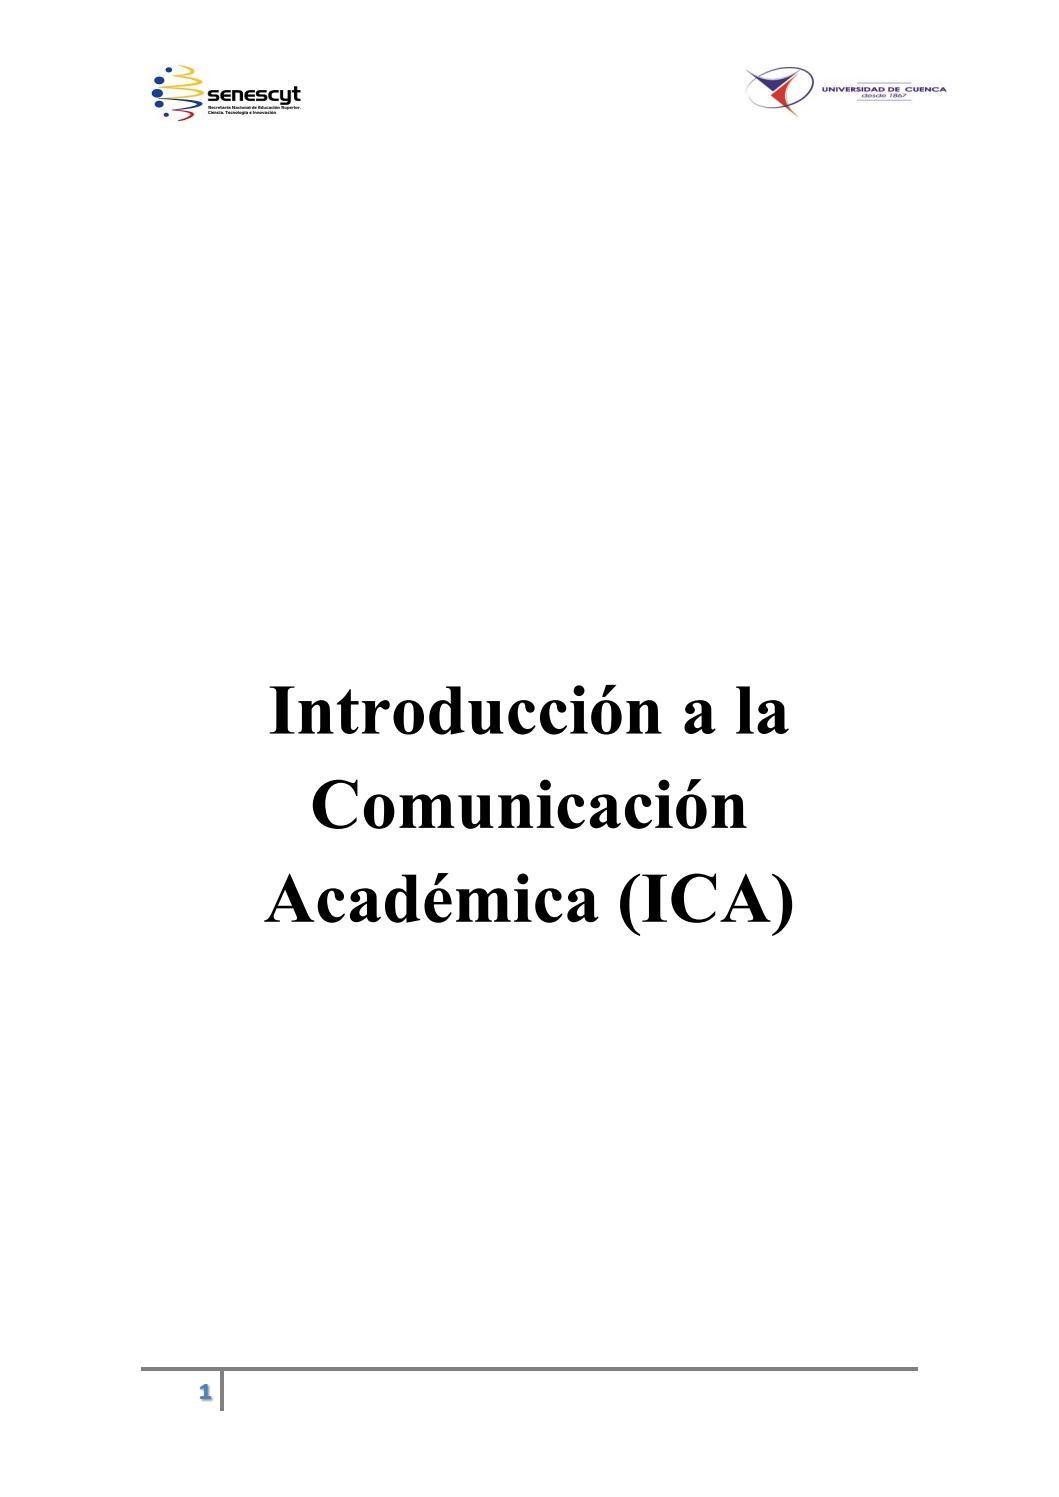 Introducción A La Comunicación Académica By Kerly Ramirez